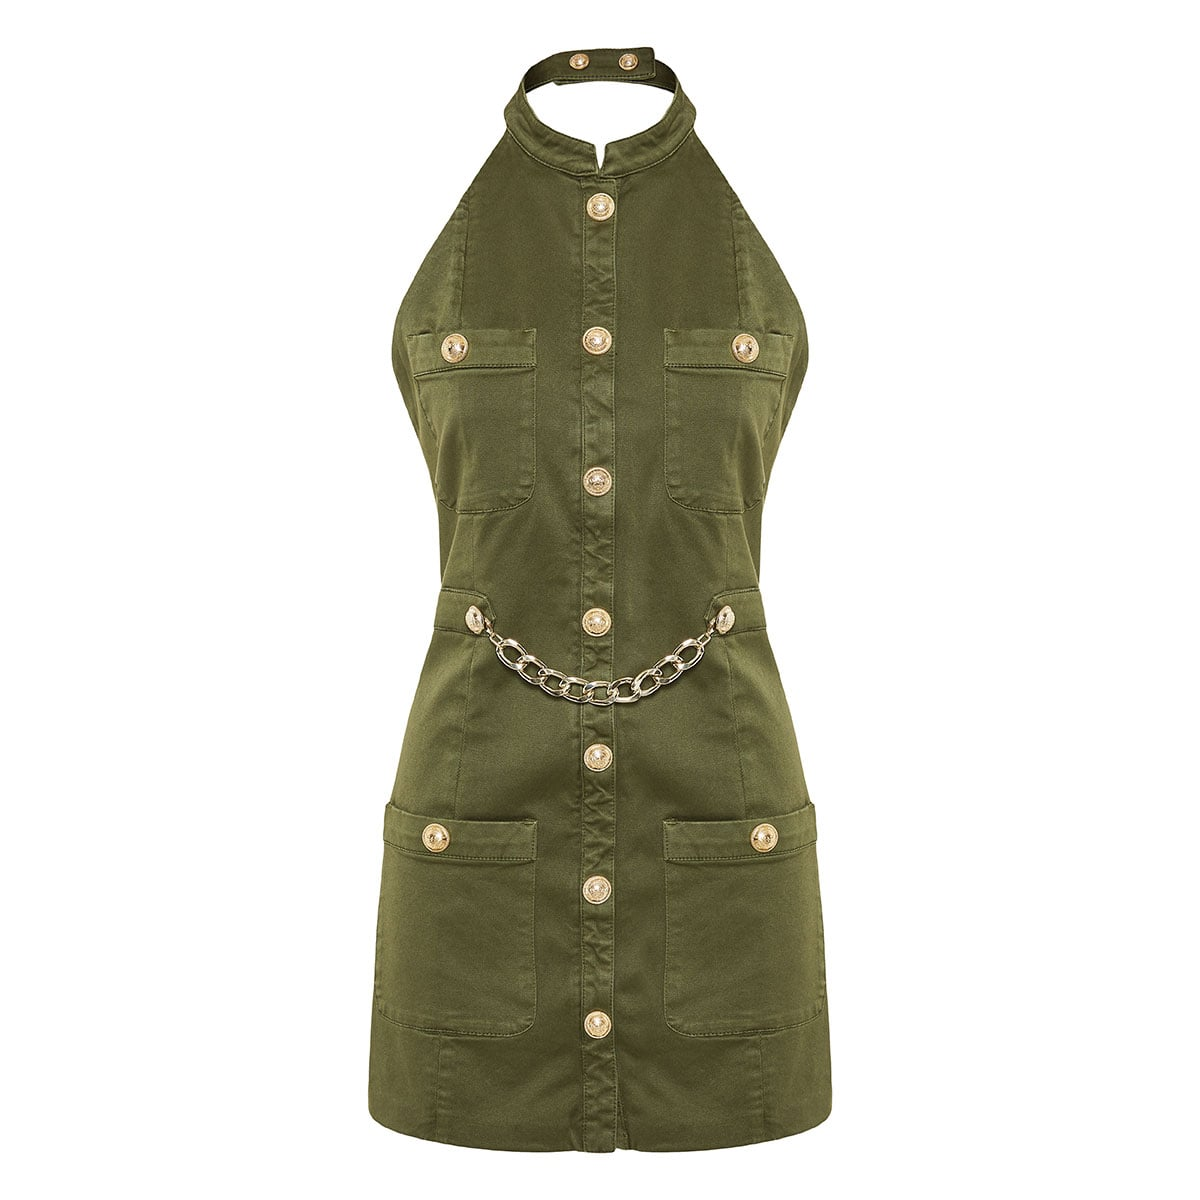 Halter-neck military mini dress